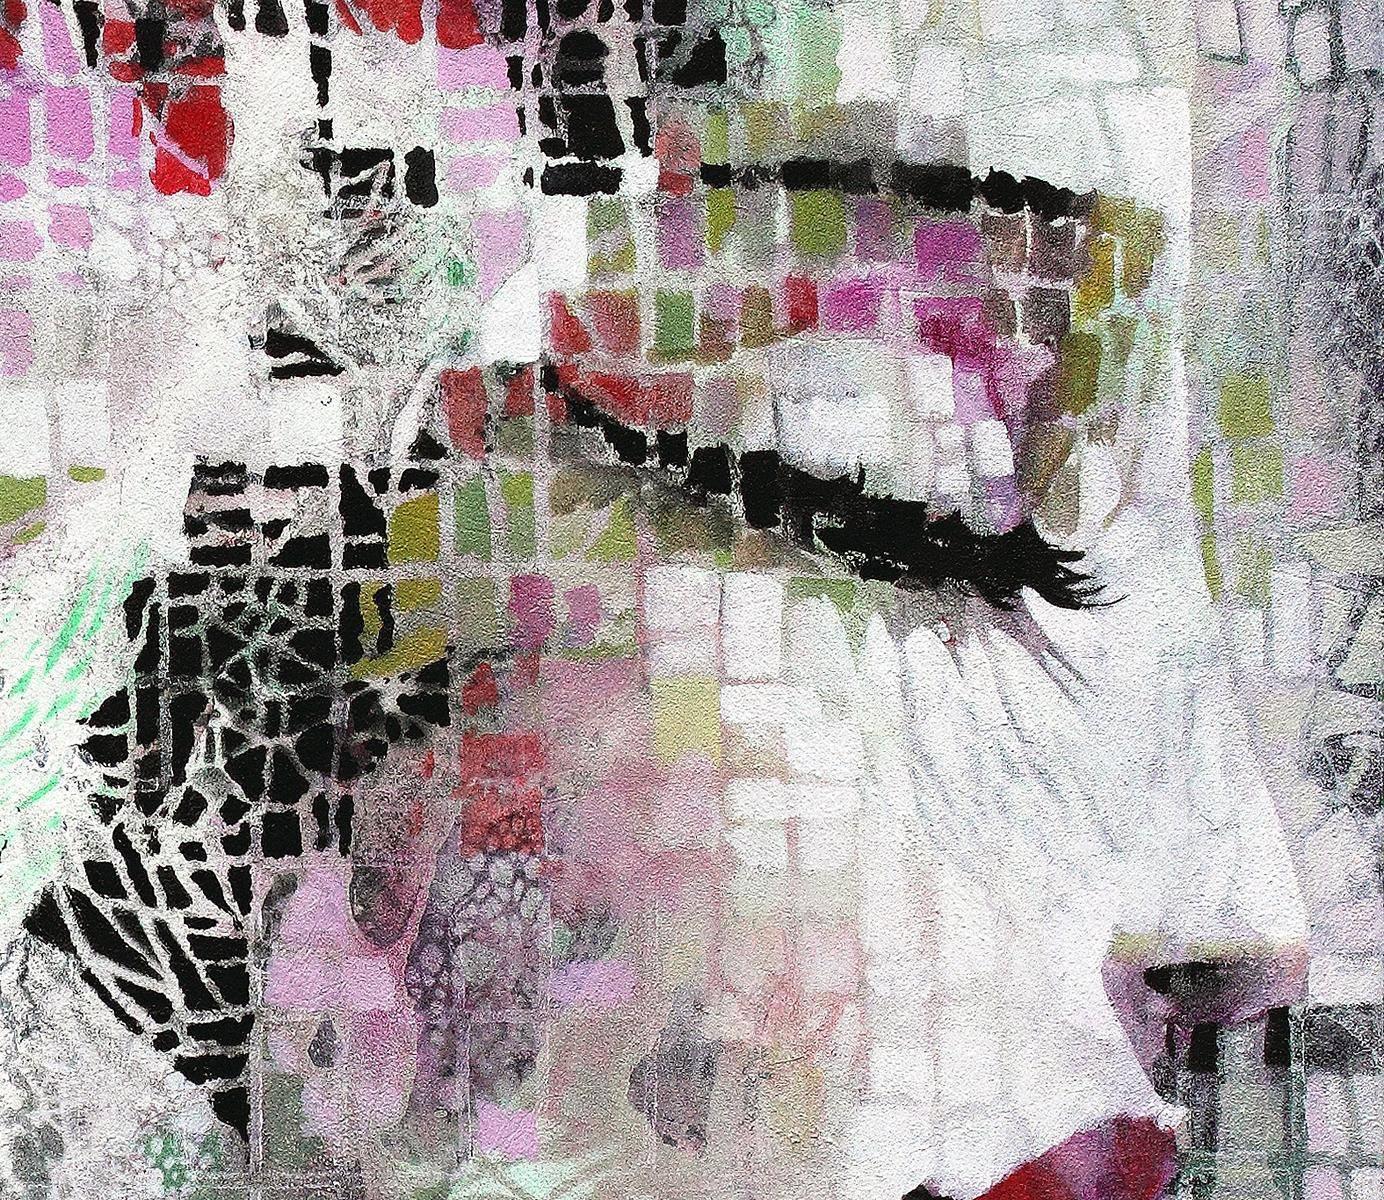 SERIES ART DECO, Dreaming Nymph